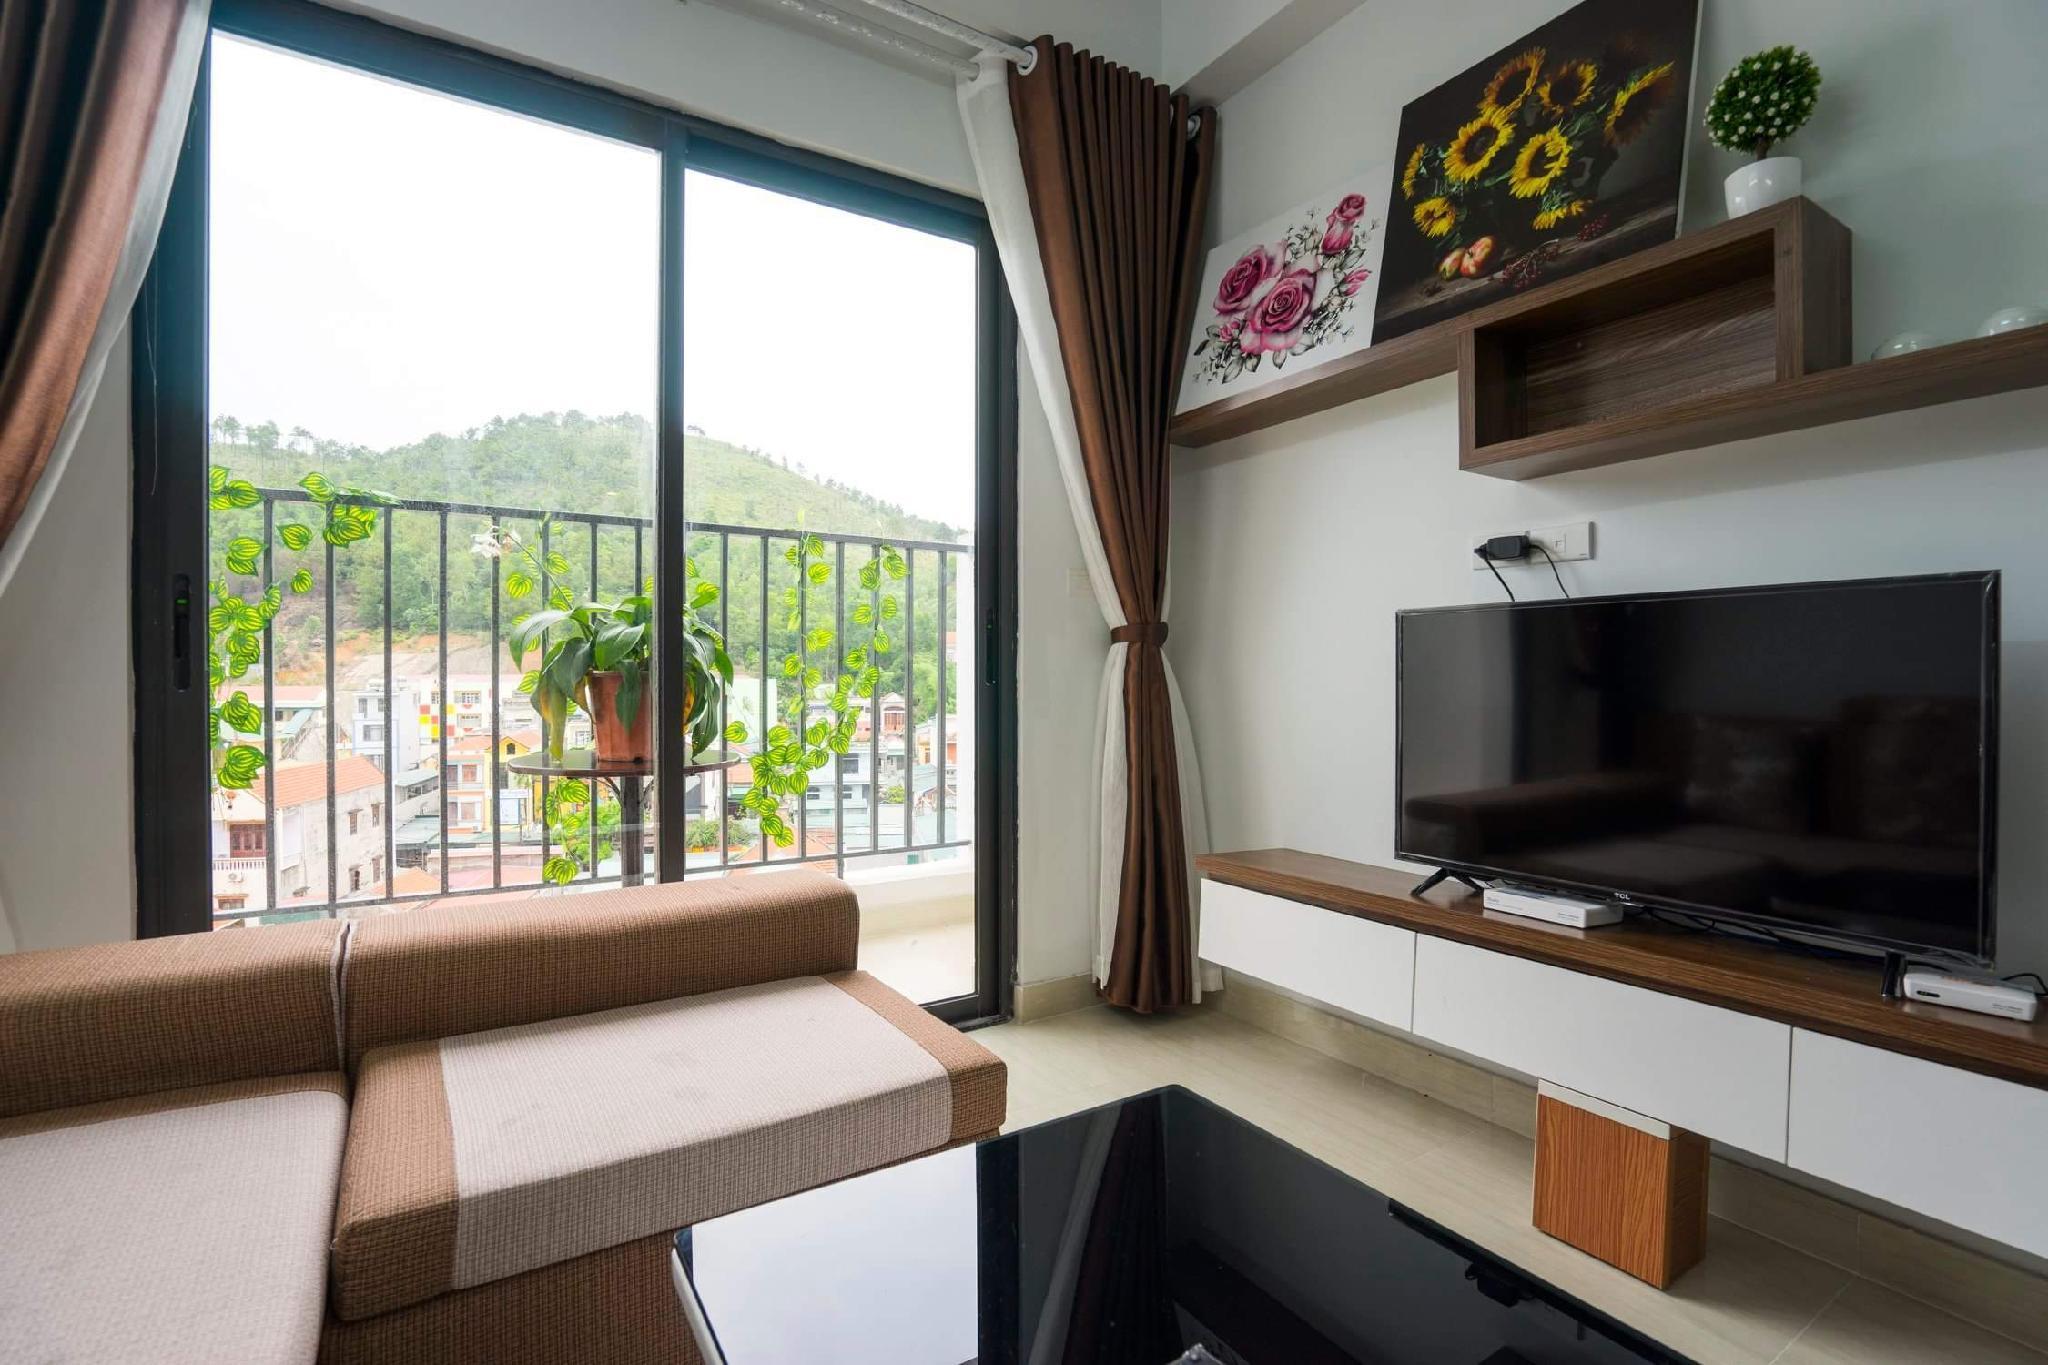 S6 703 Sunrise Apartment Ha Long